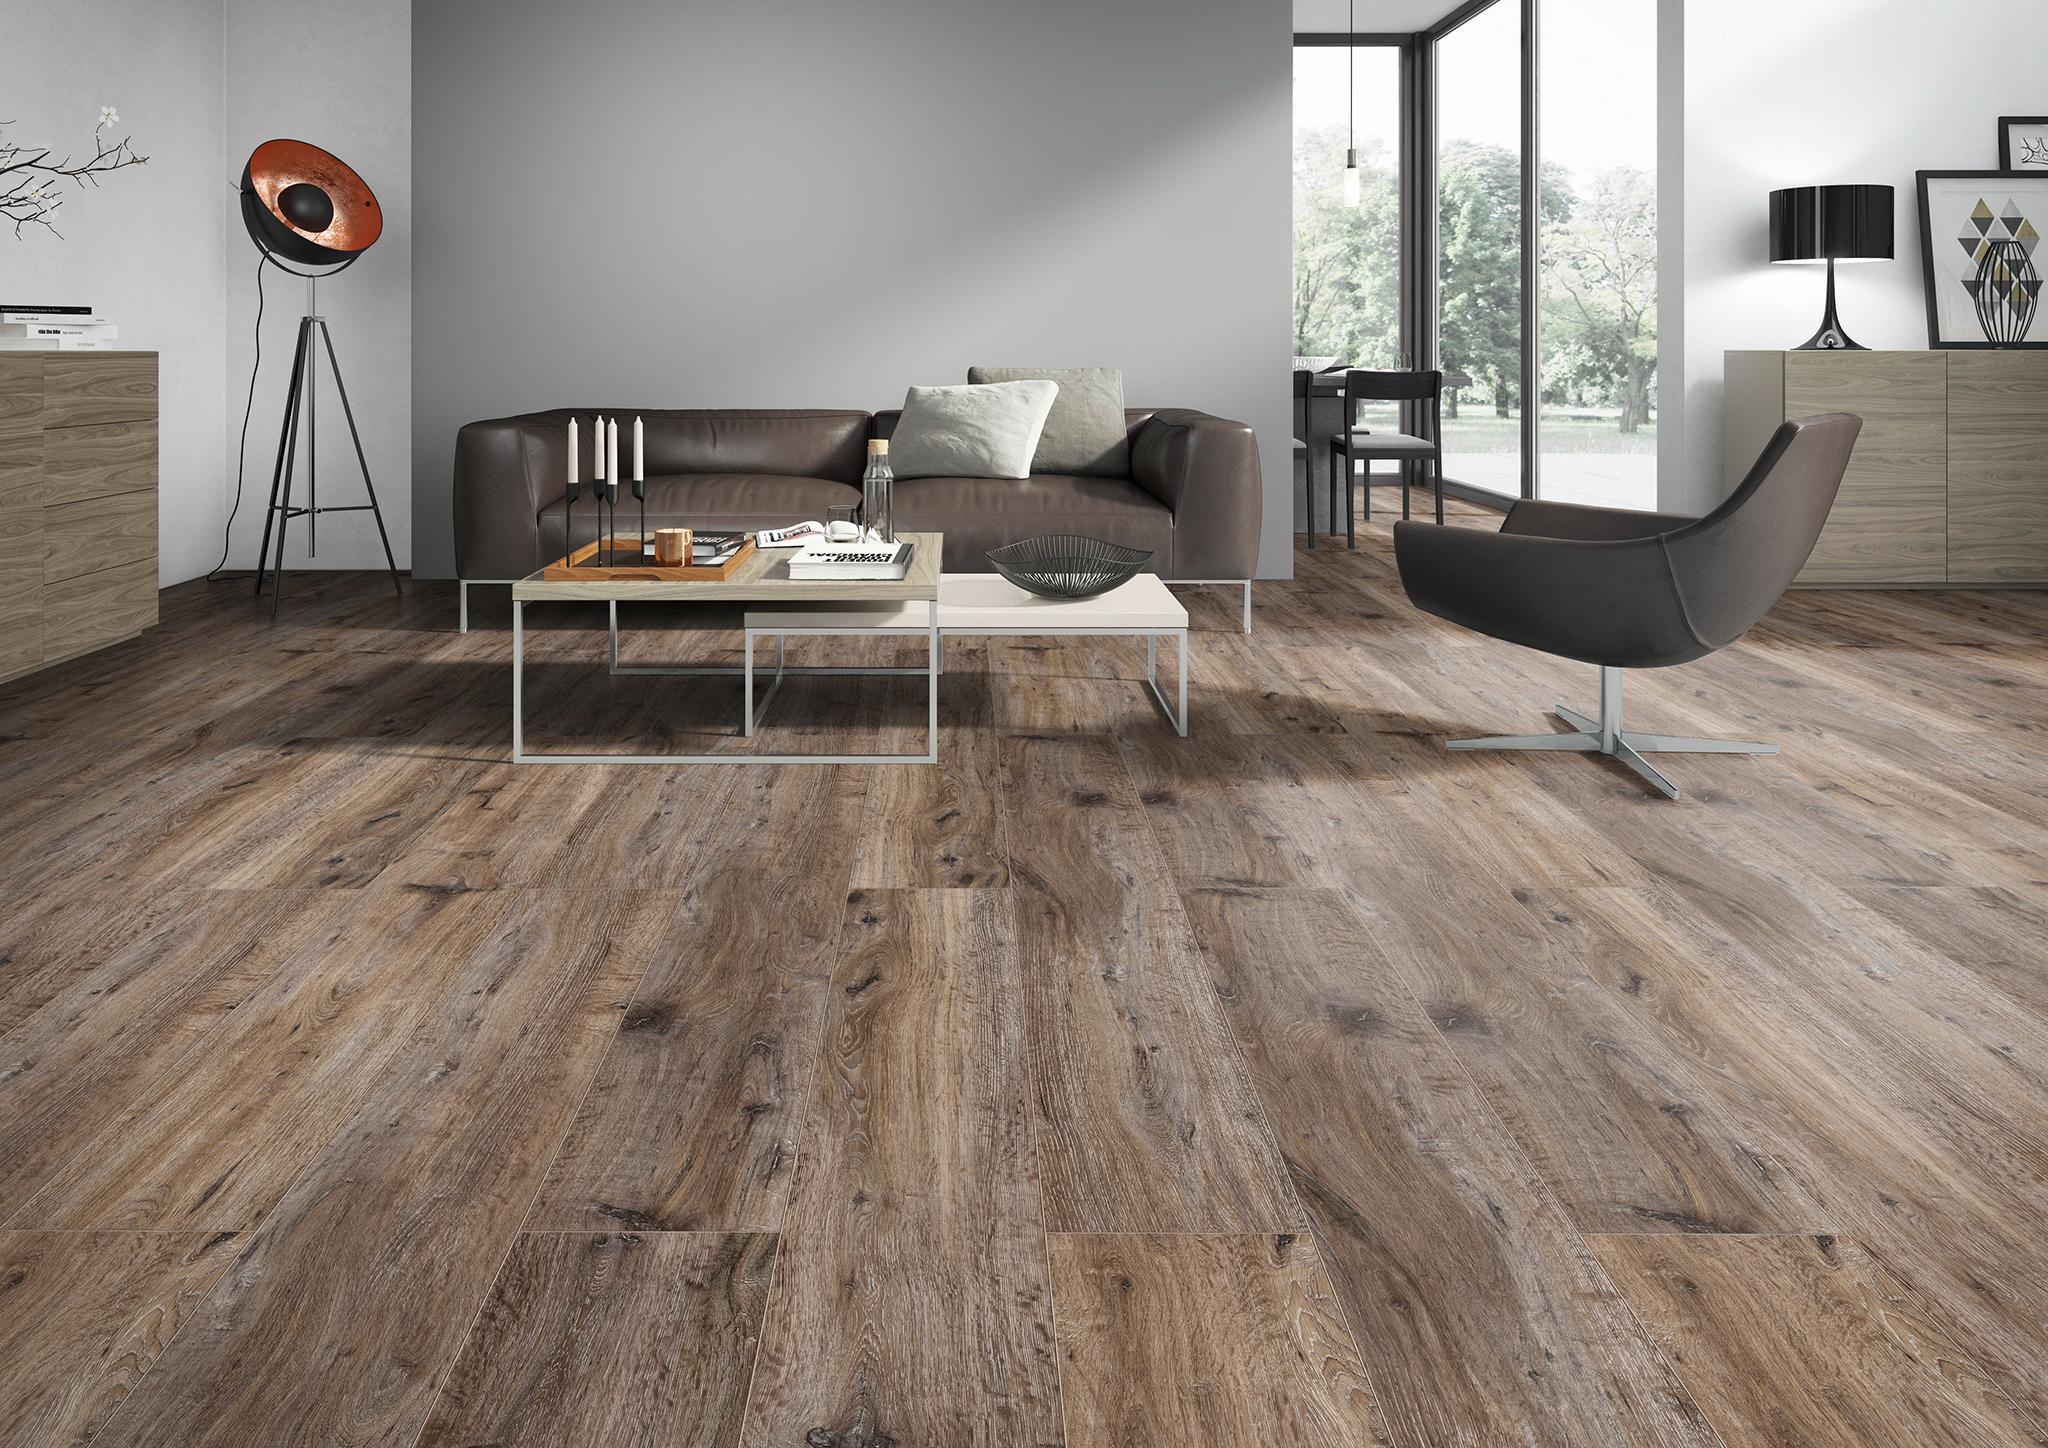 Design floor Sono Skyline Coffee House